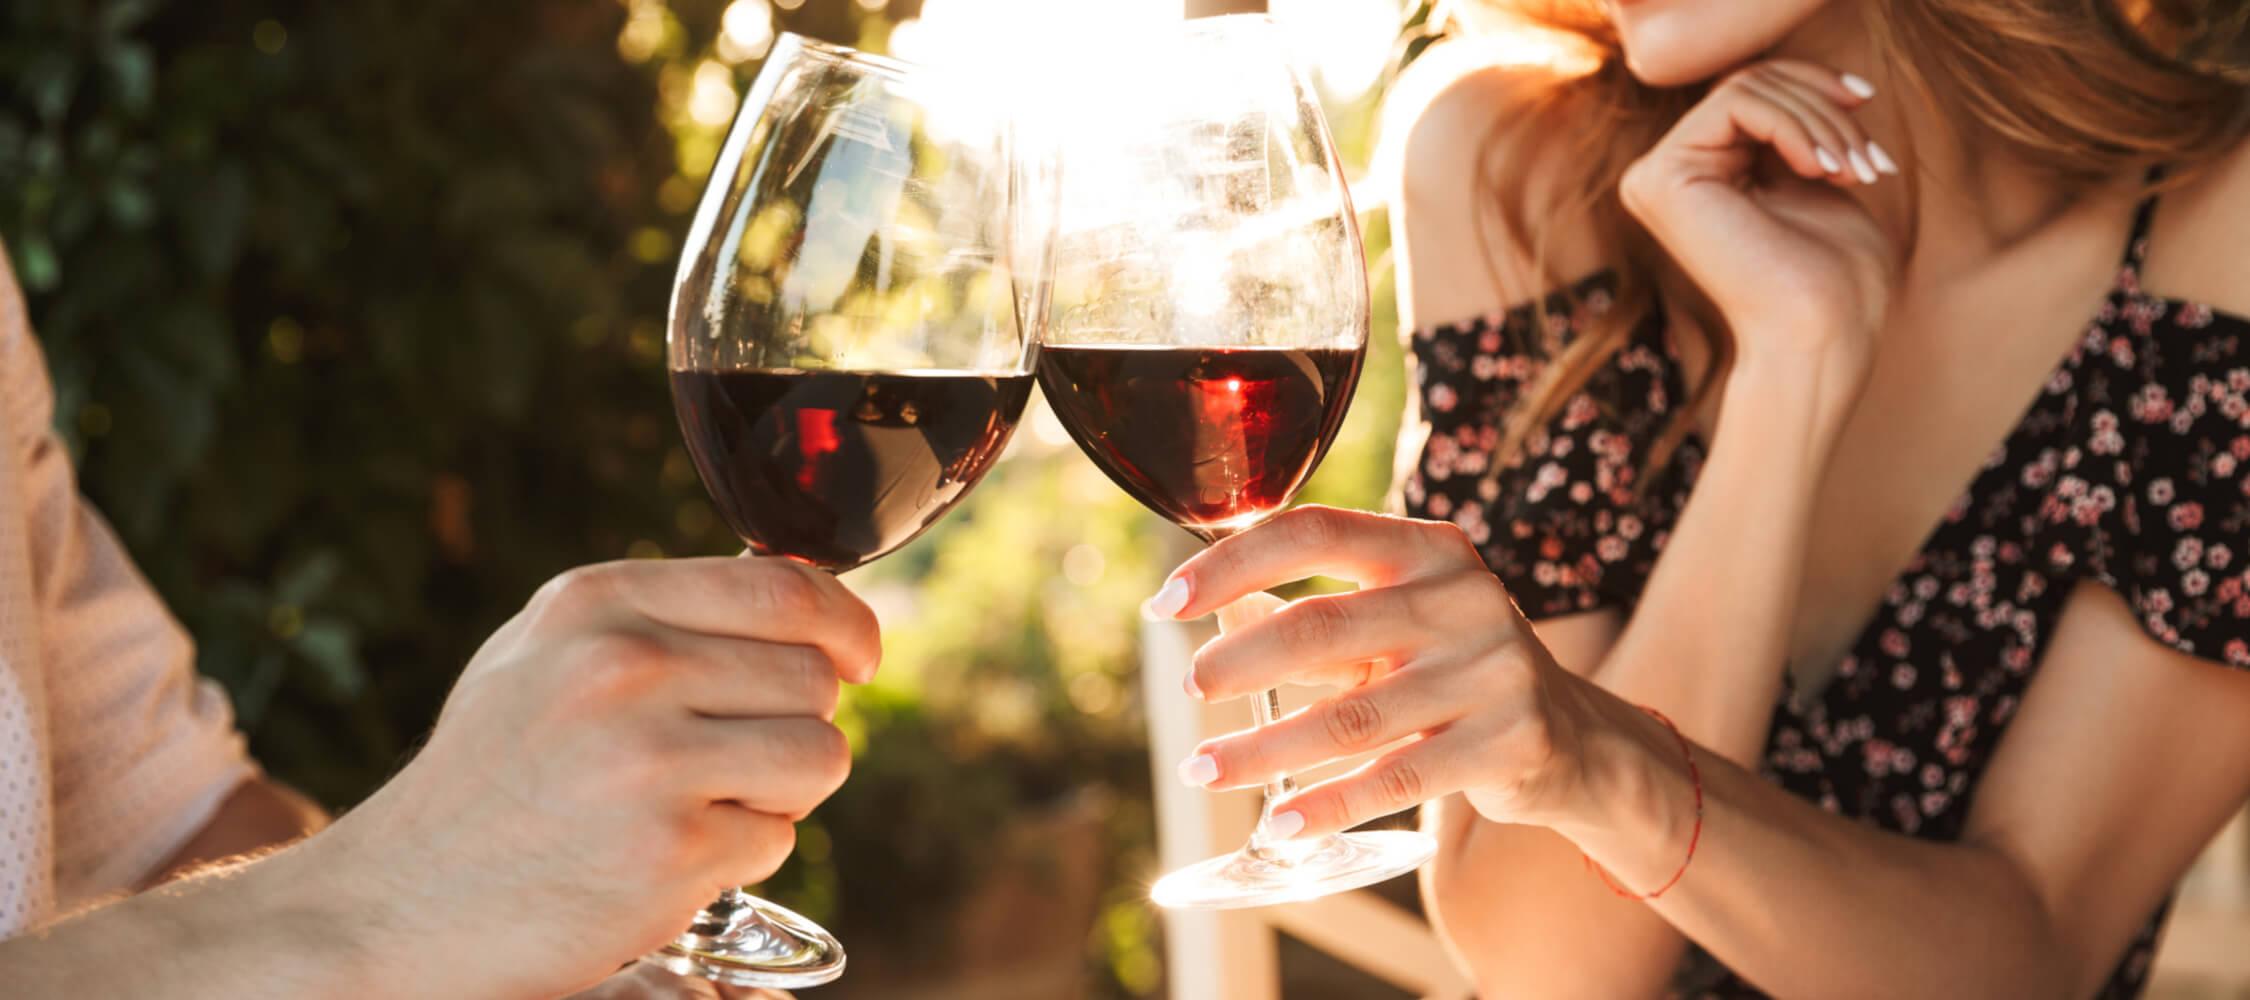 Hotel-Villa-Laurus-Merano-Bar-Drink-Wein-Paar-Frau-Detail-217162430_L-2250x1000